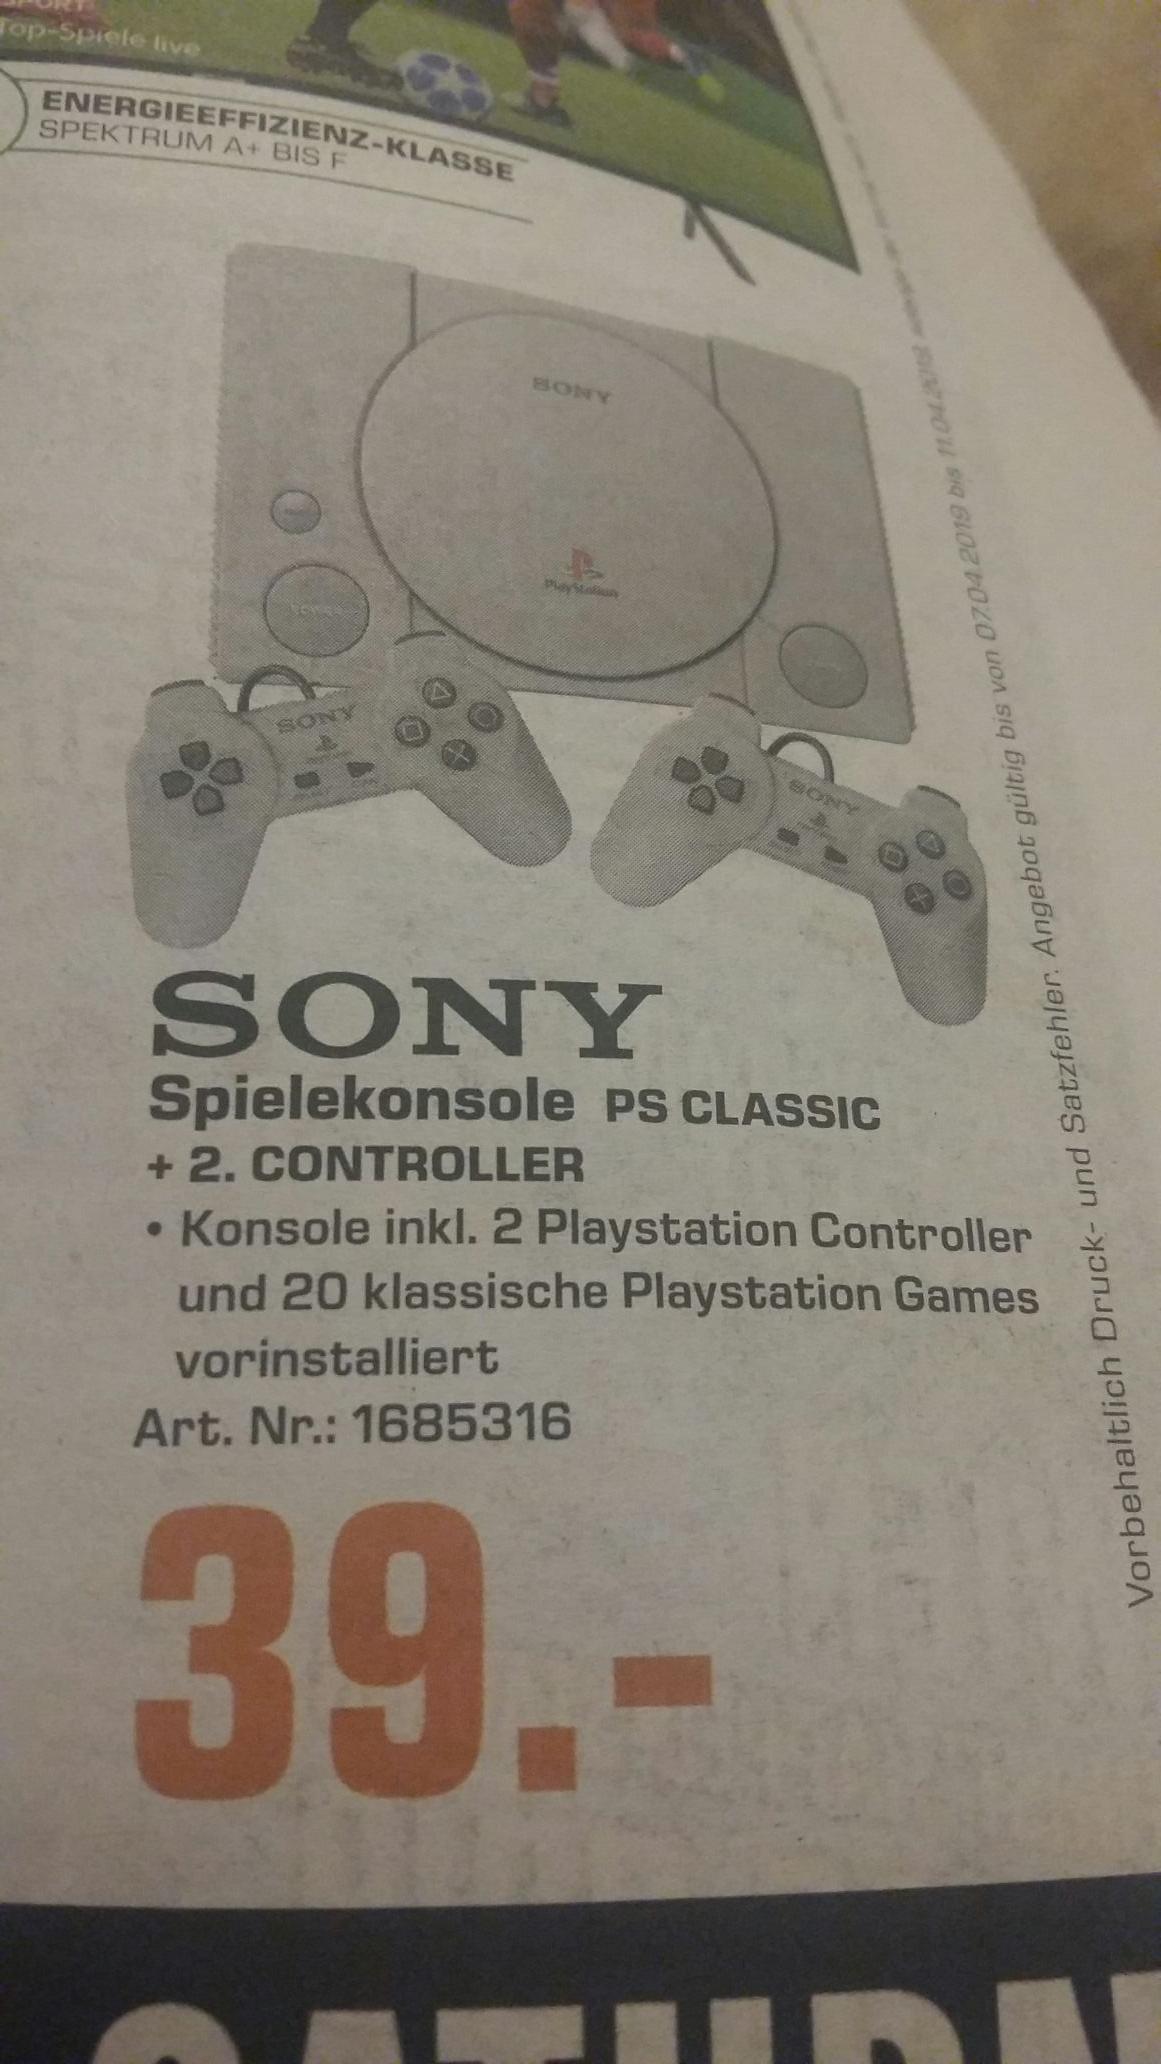 Sony PS Classic Mini